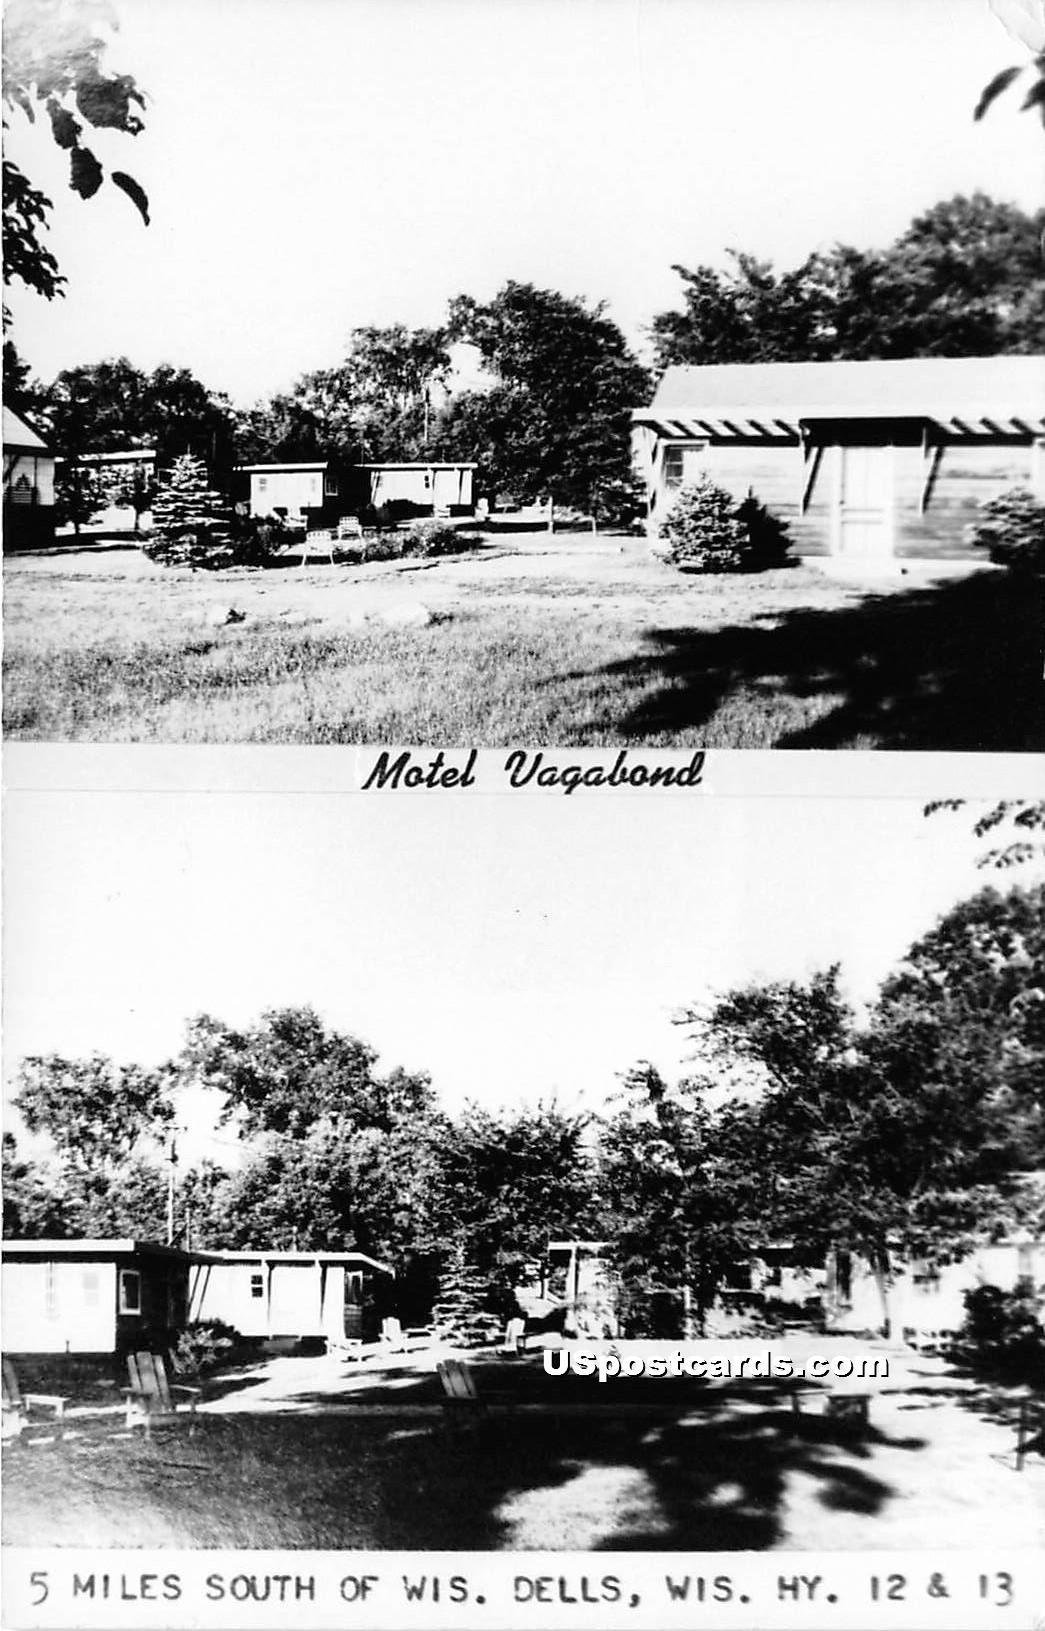 Motel Vagabond - Wisconsin Dells Postcards, Wisconsin WI Postcard